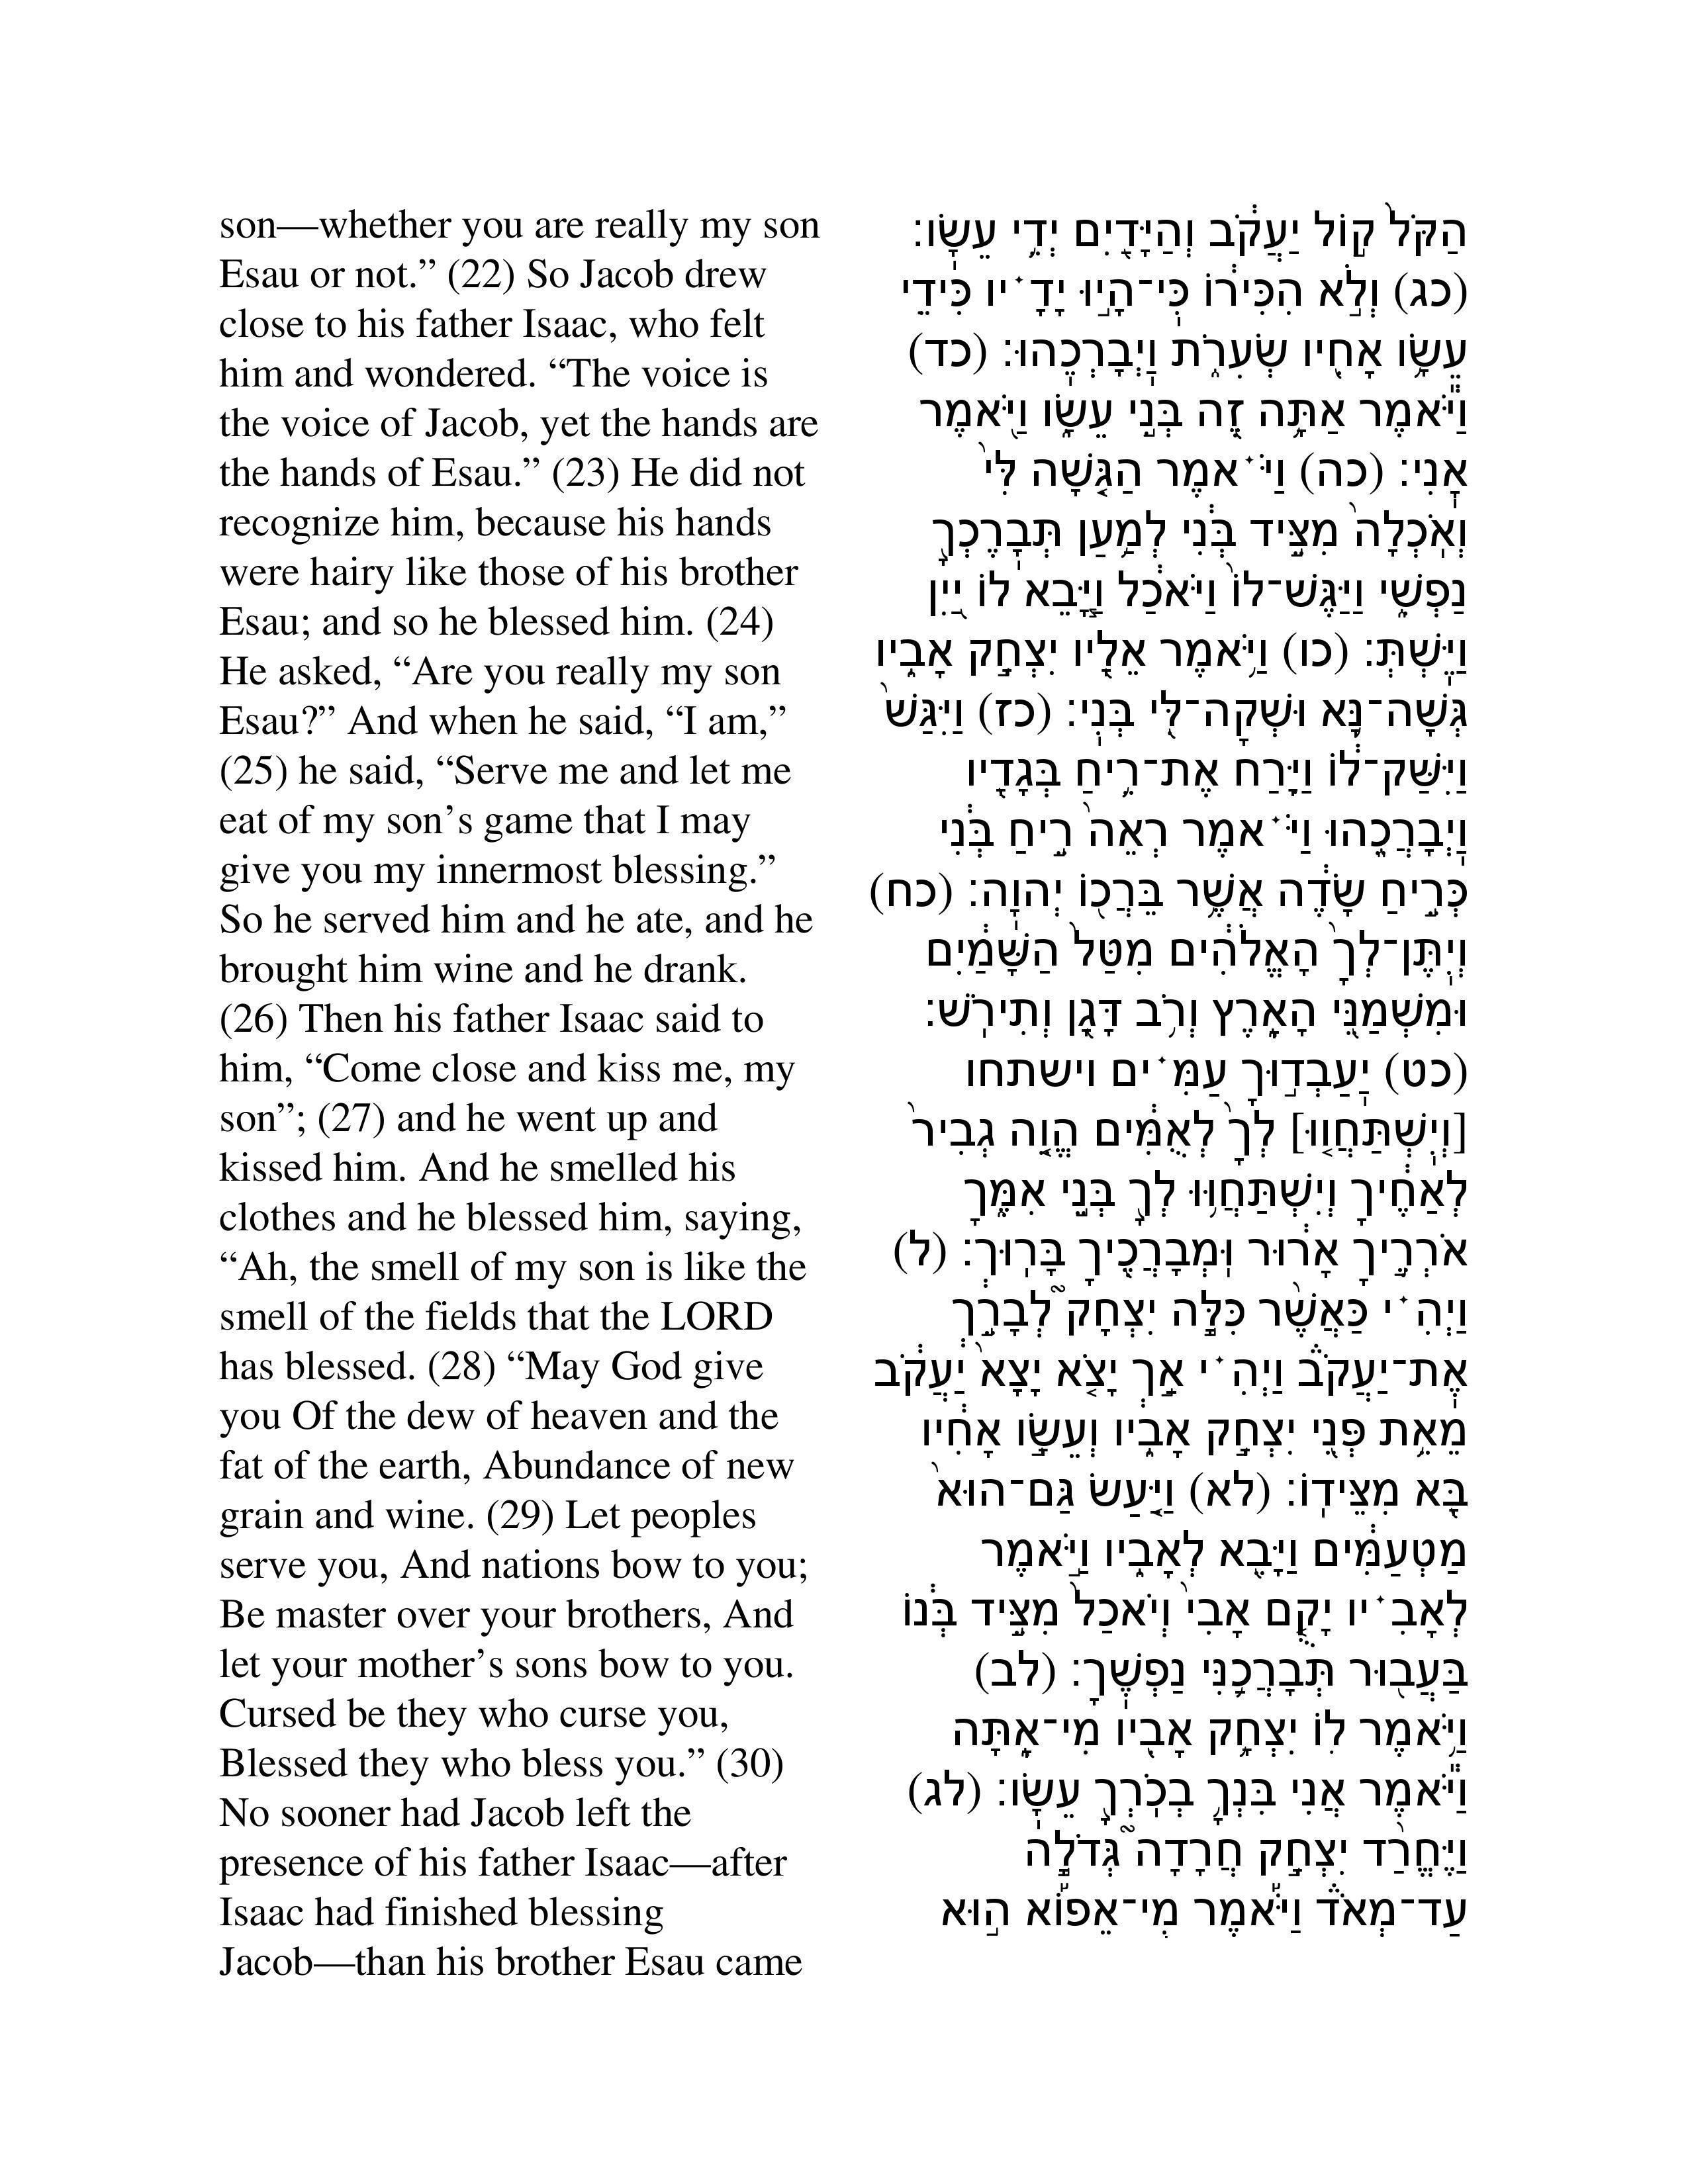 Isaac, Jacob, and Esau 3